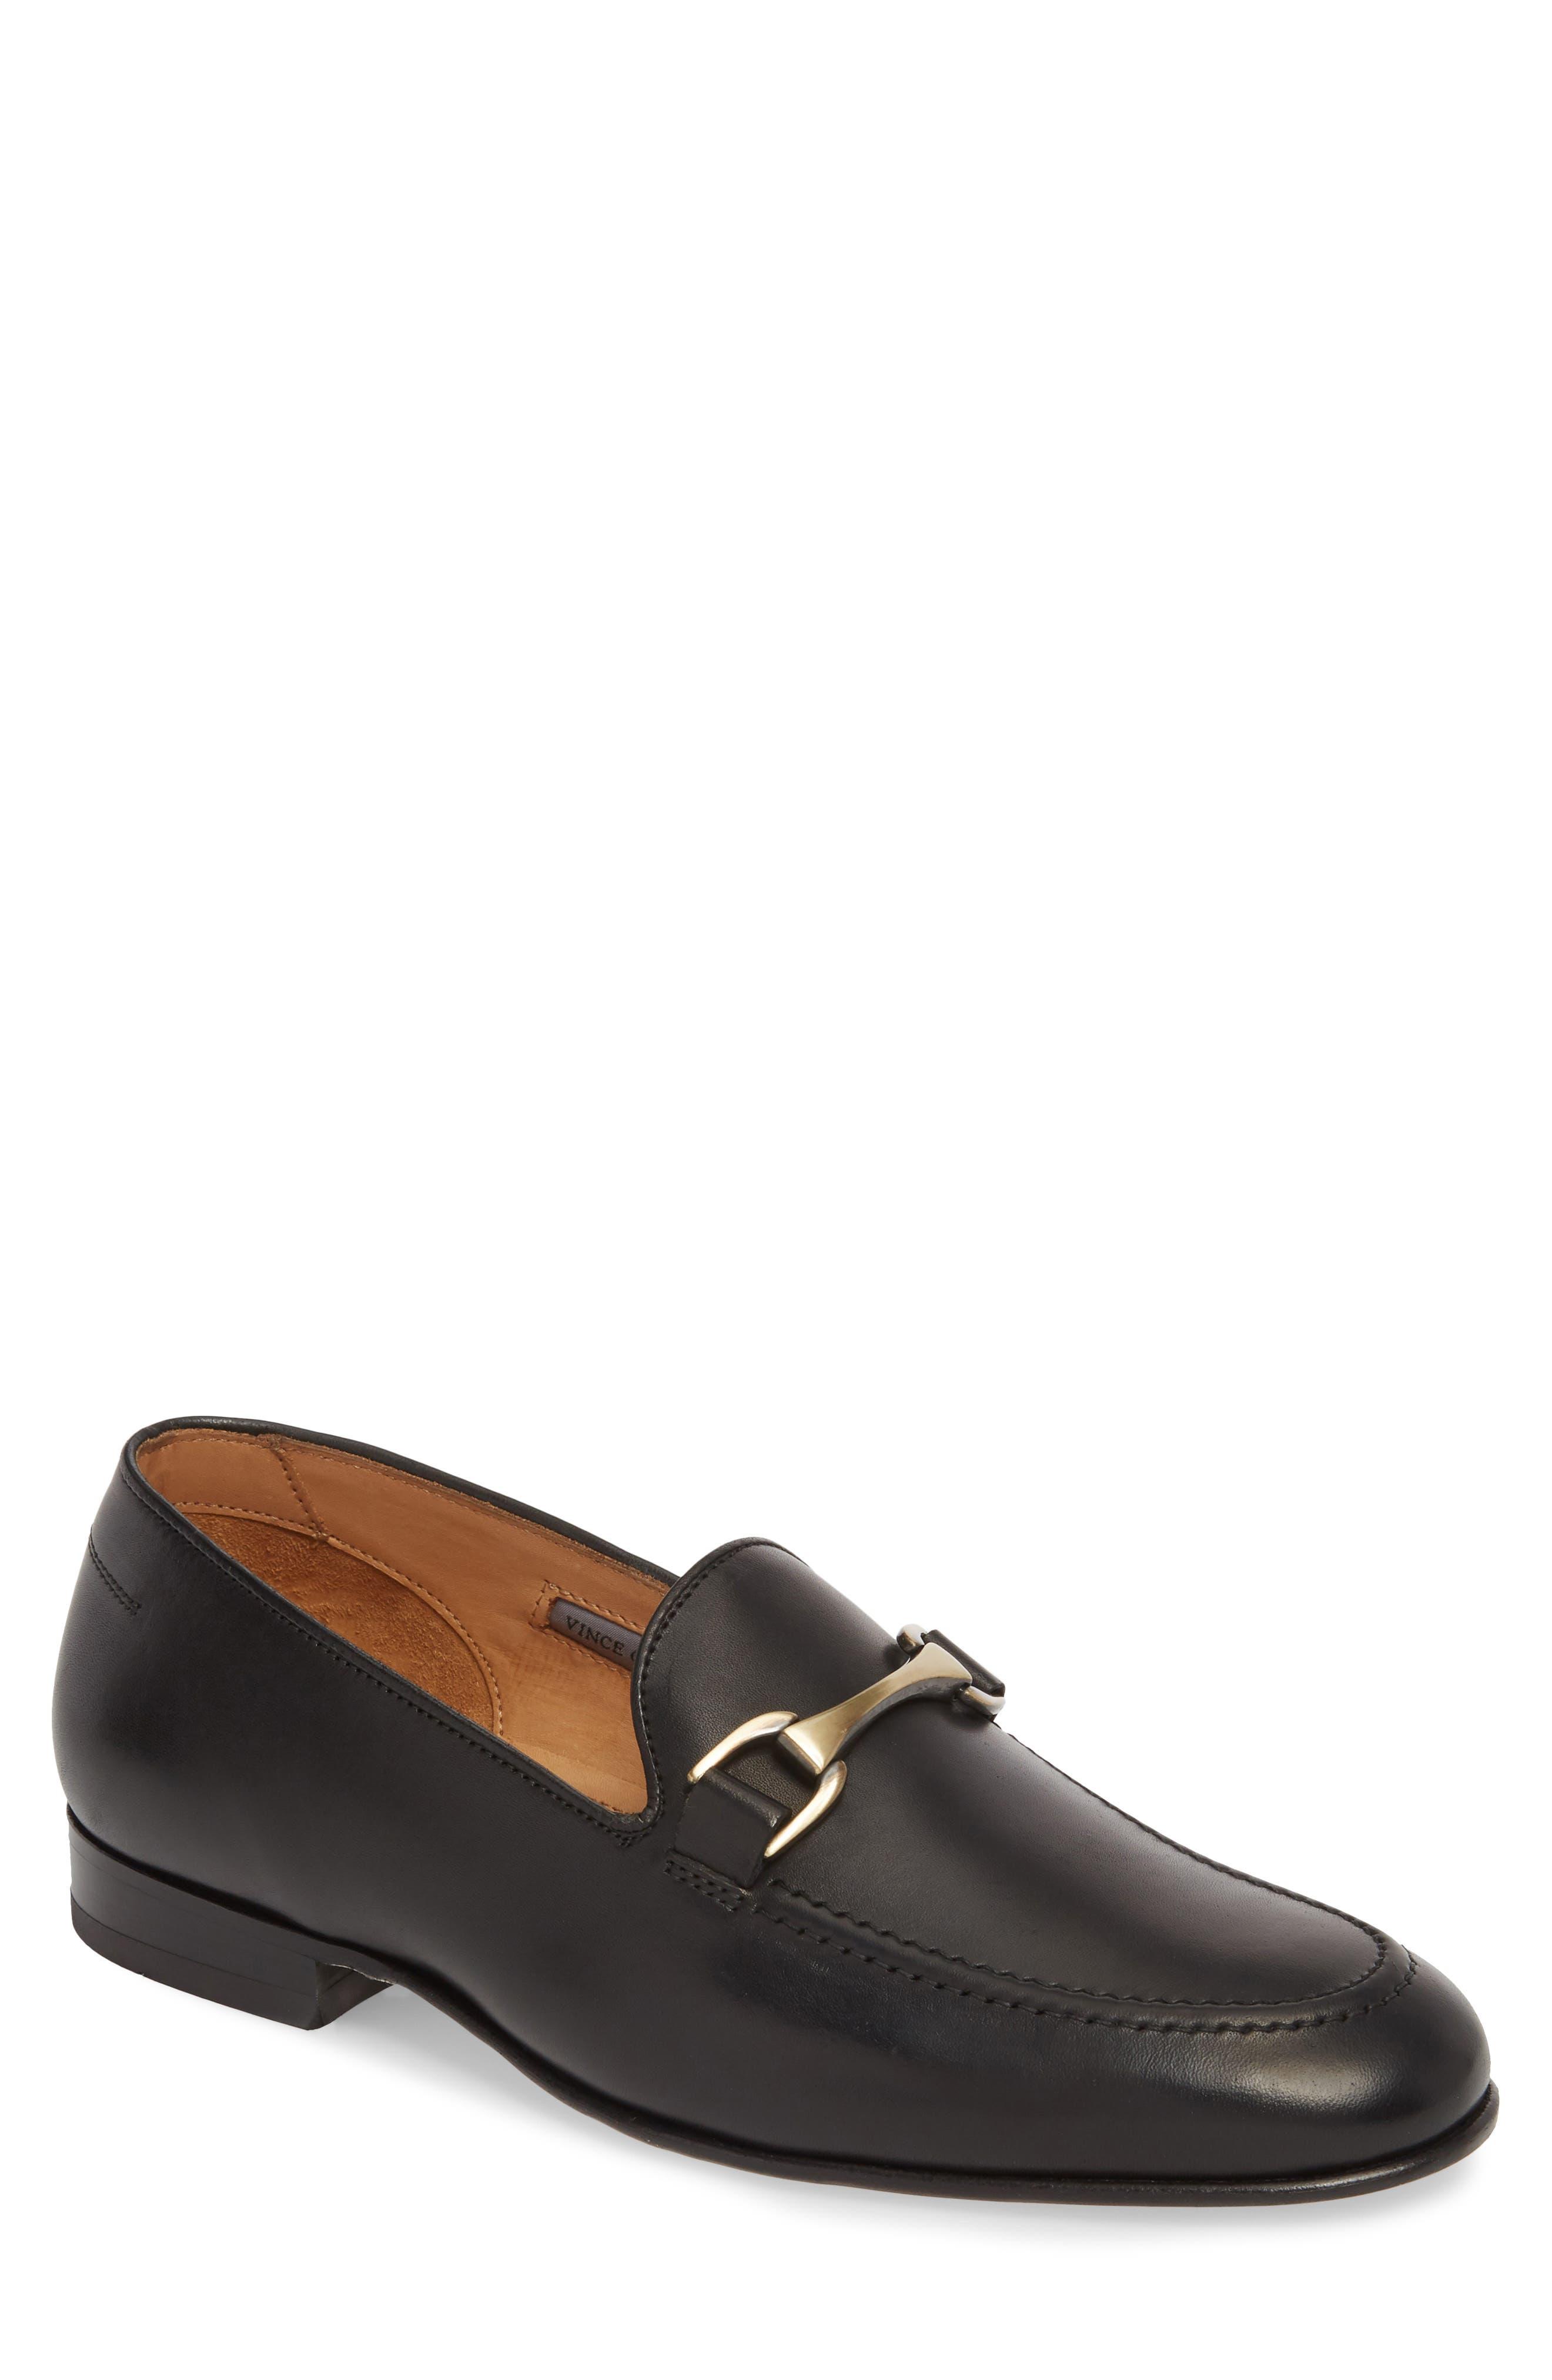 'Borcelo' Bit Loafer,                             Main thumbnail 1, color,                             Black Leather